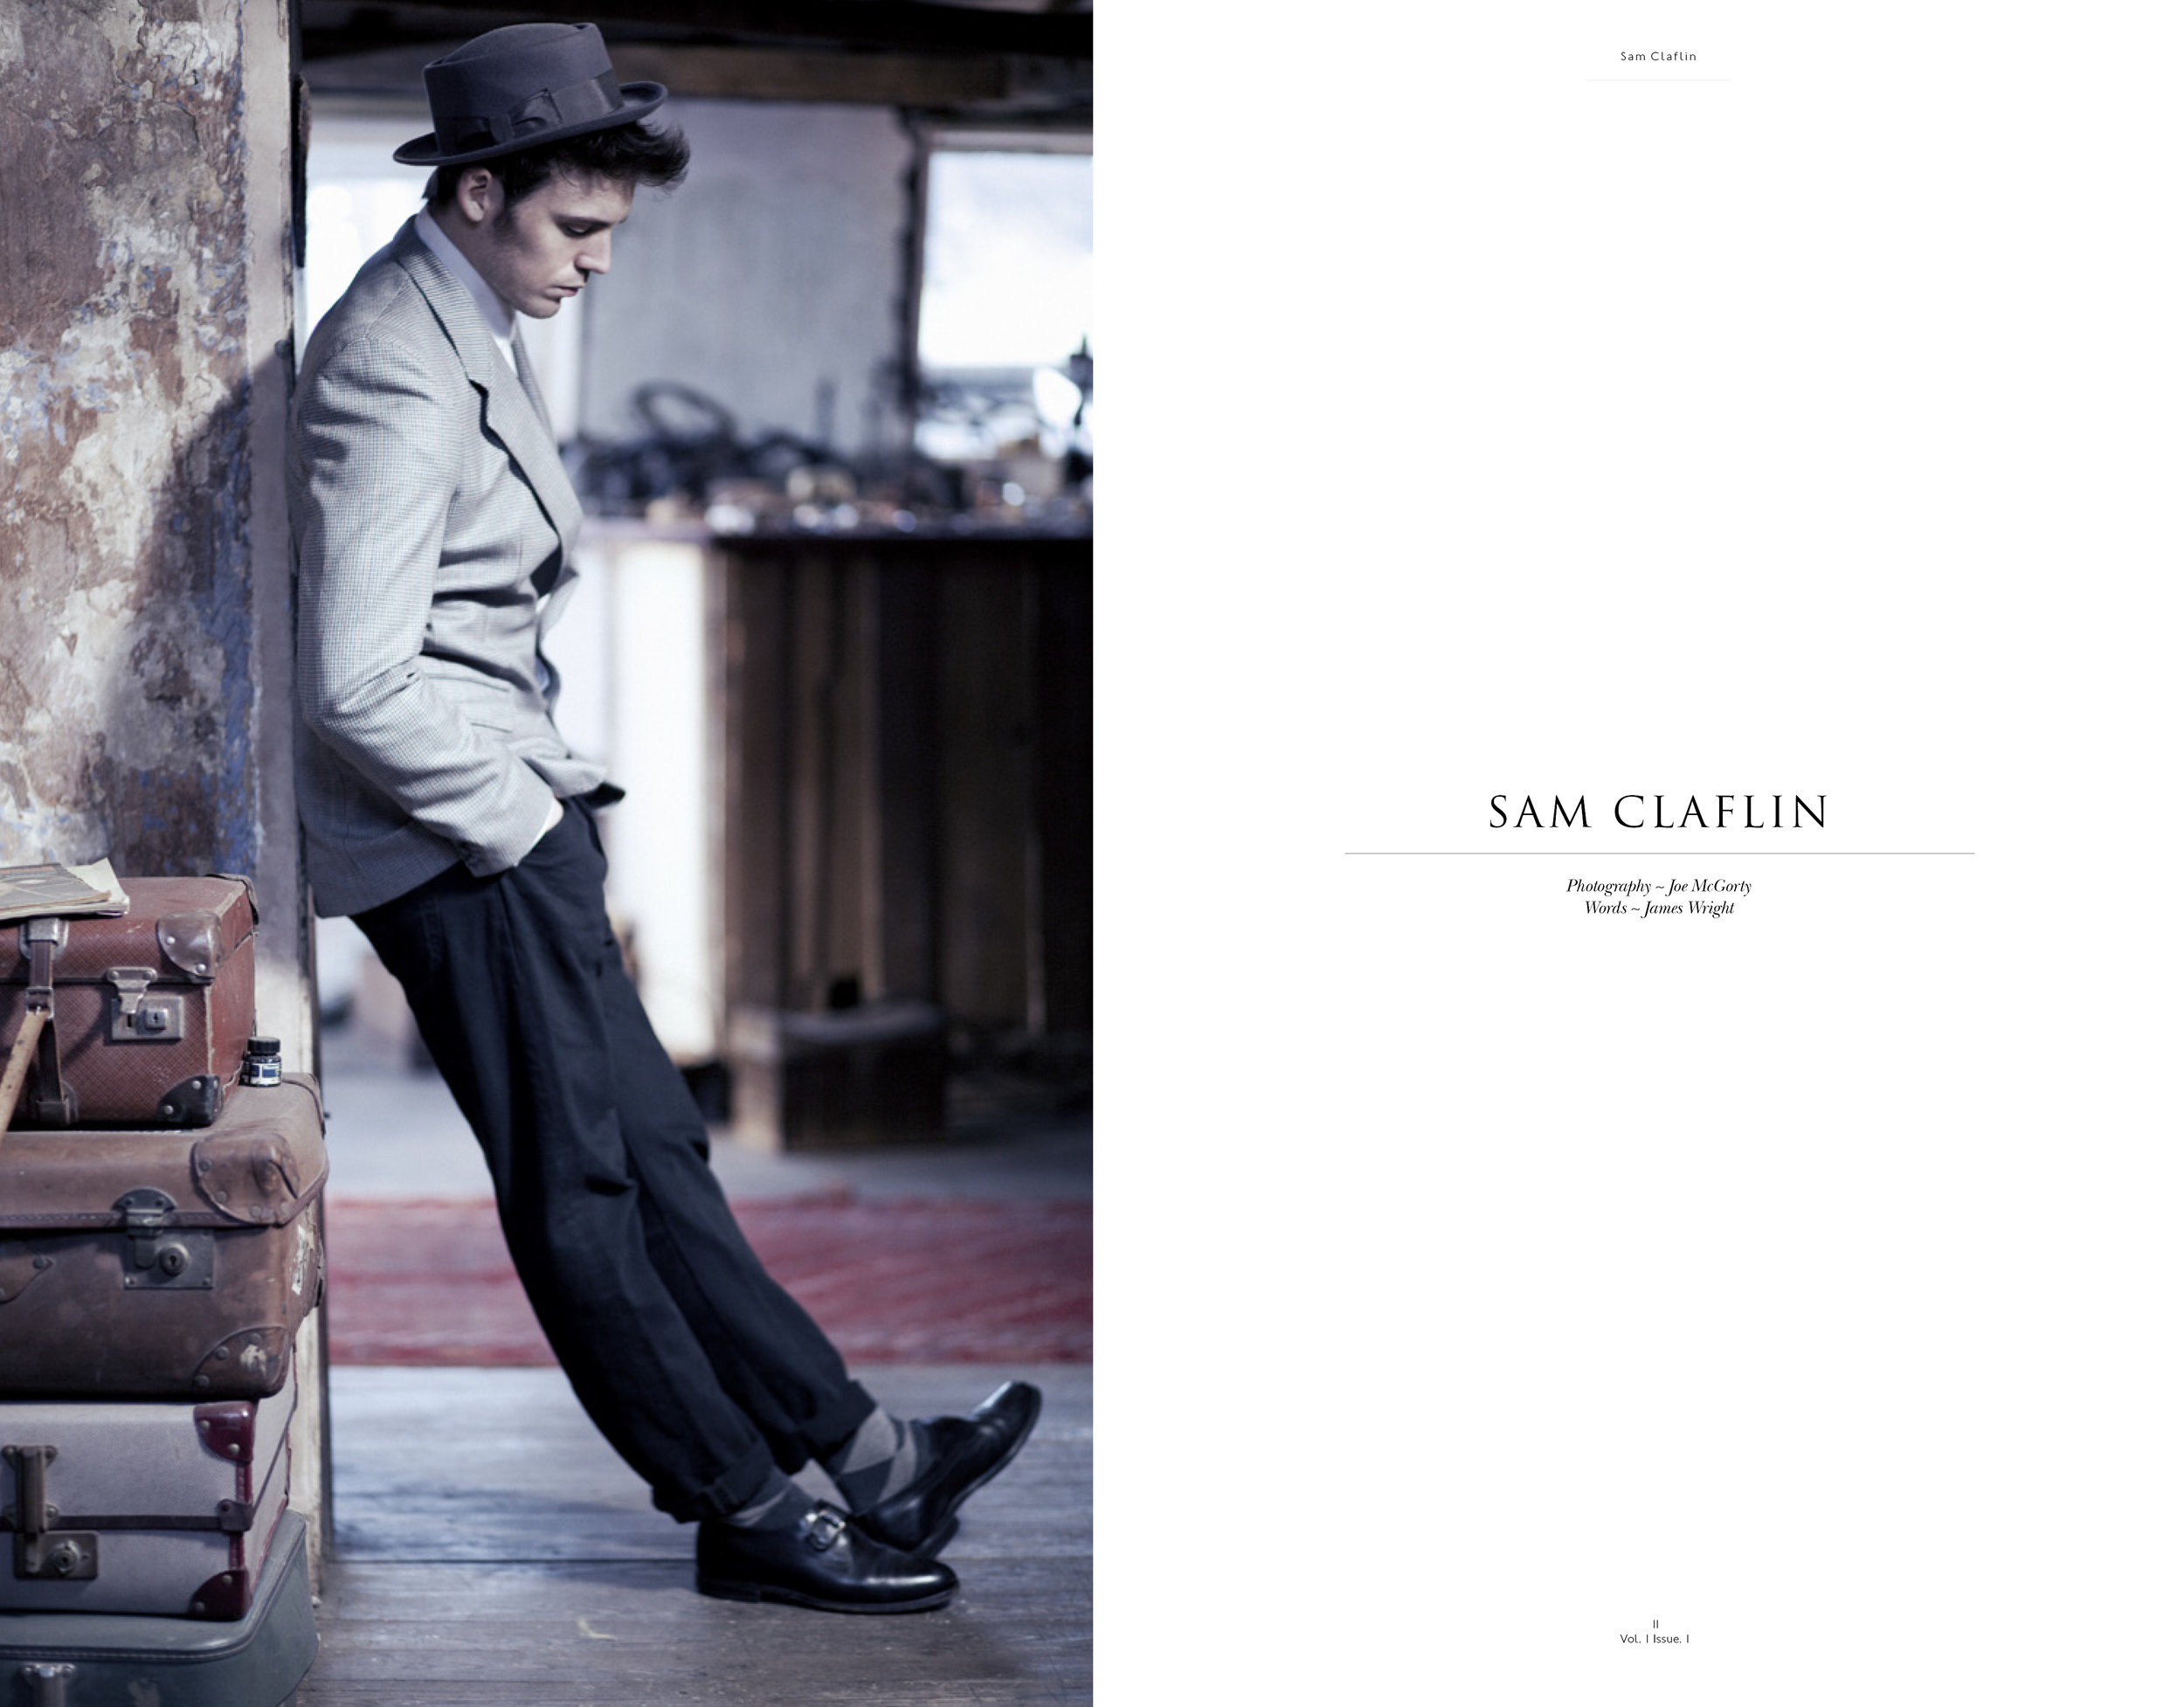 Sam-Claflin-copy-1.jpg